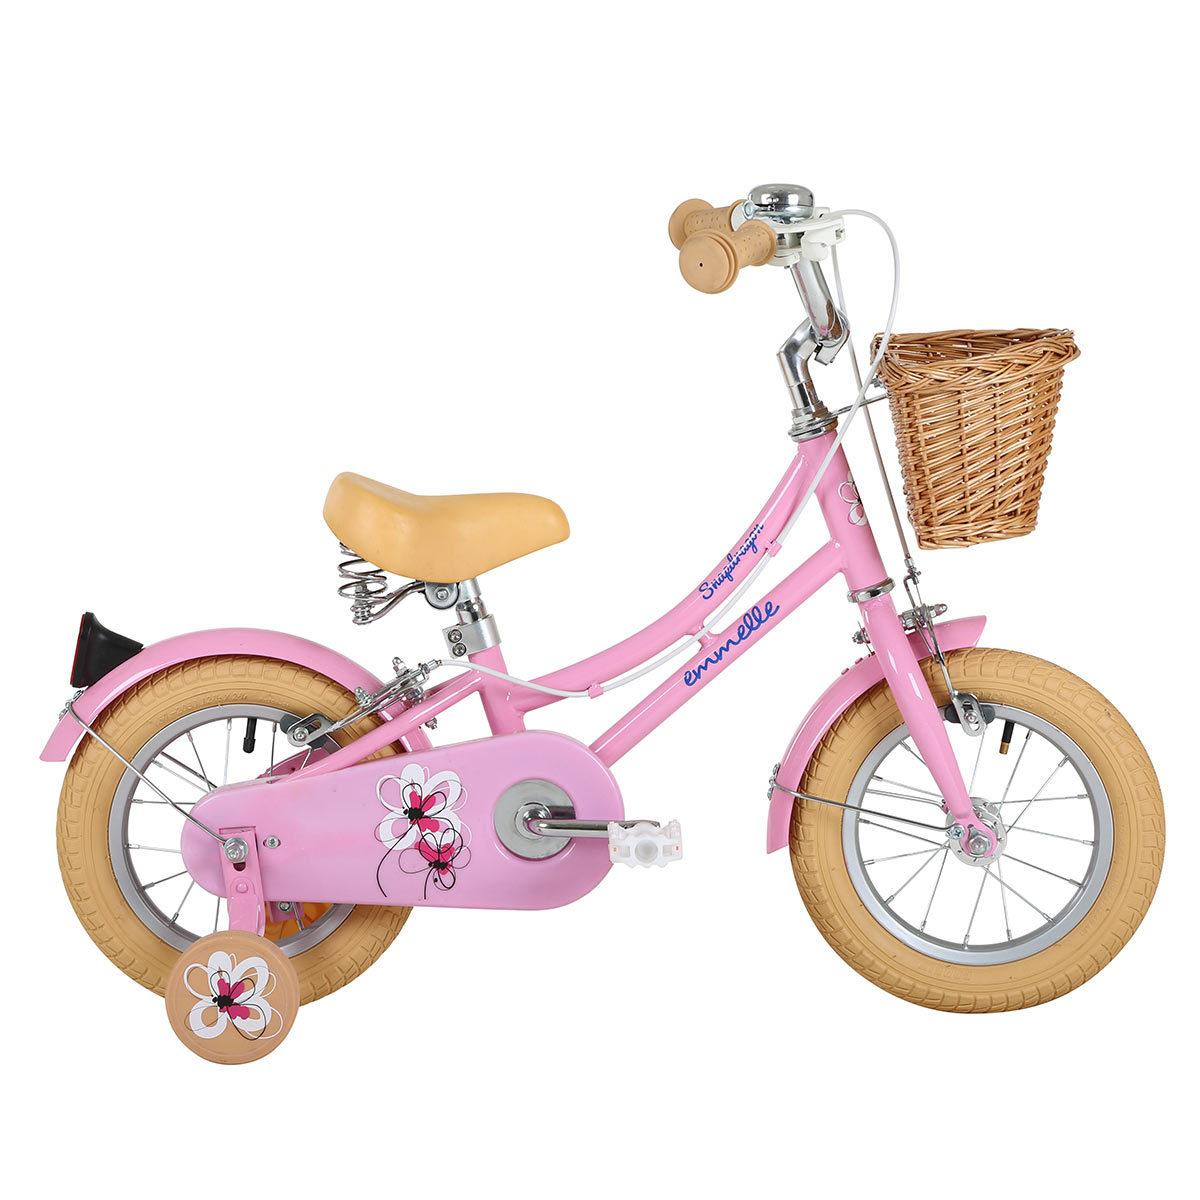 Child/'s Specific Bike Saddle Bicycle kid Seat Girls Pink //Hot Pink Flower Stamp